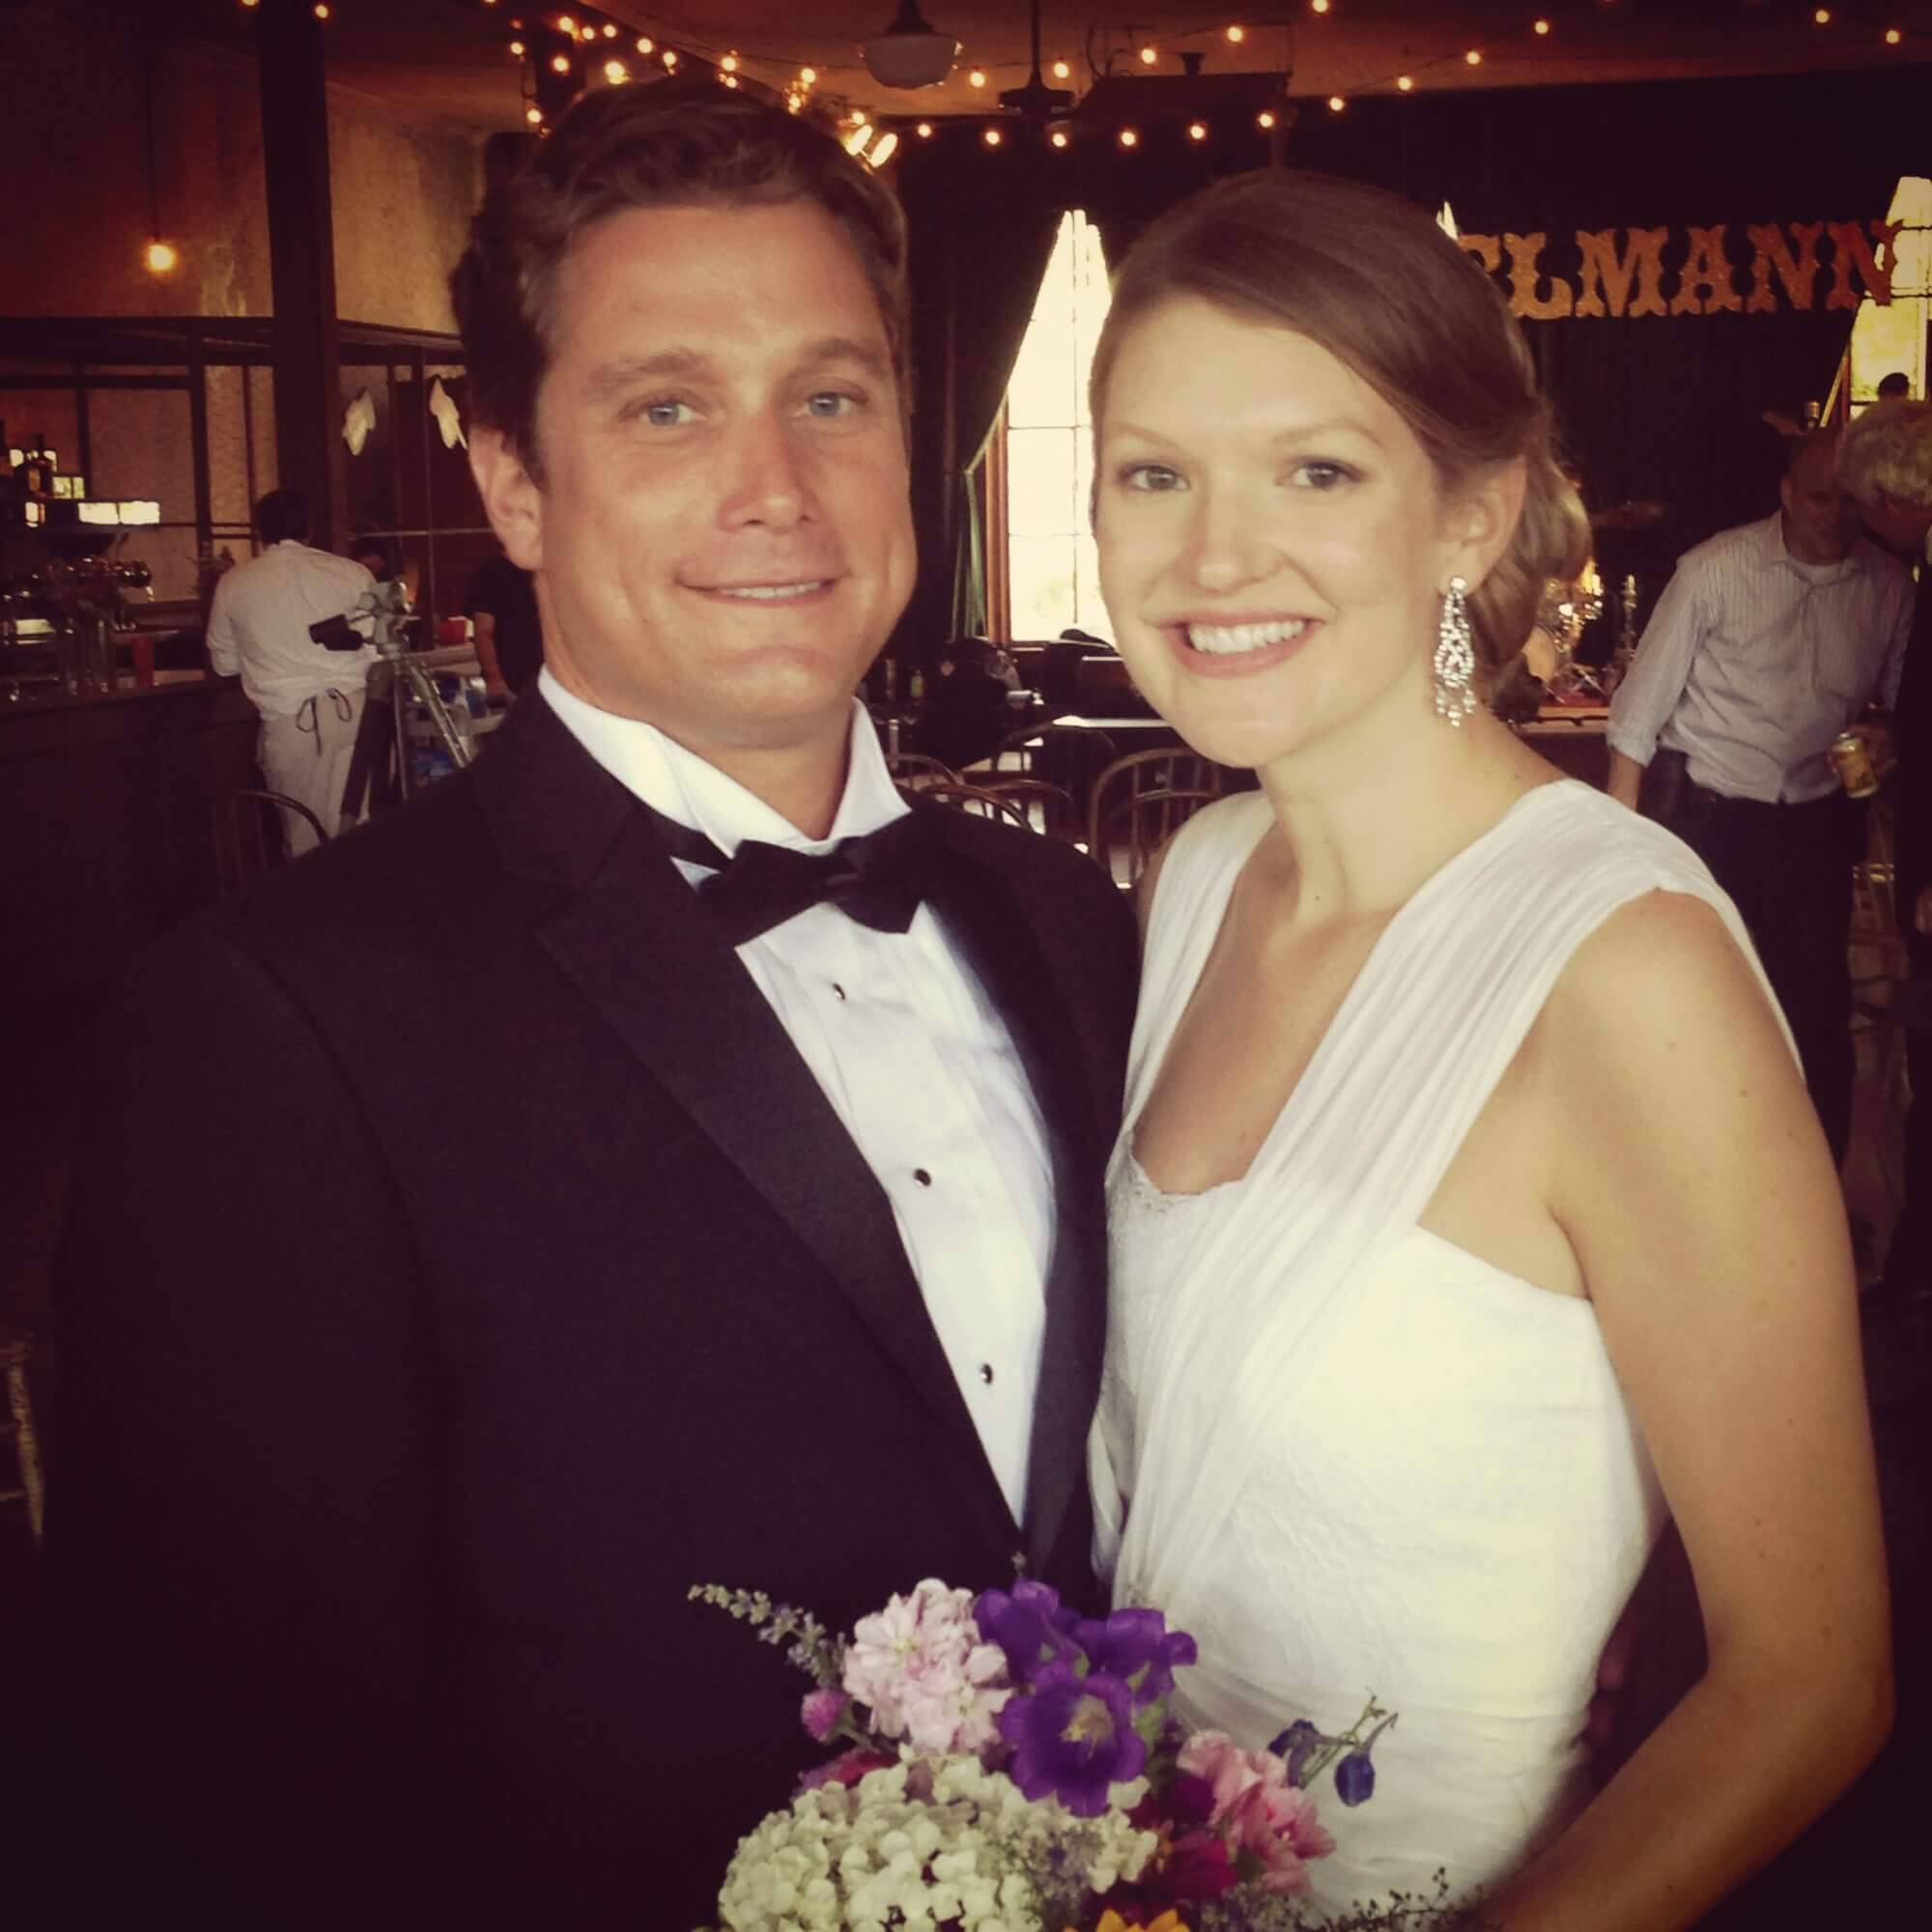 Writer Alexandra Becker on her wedding day.